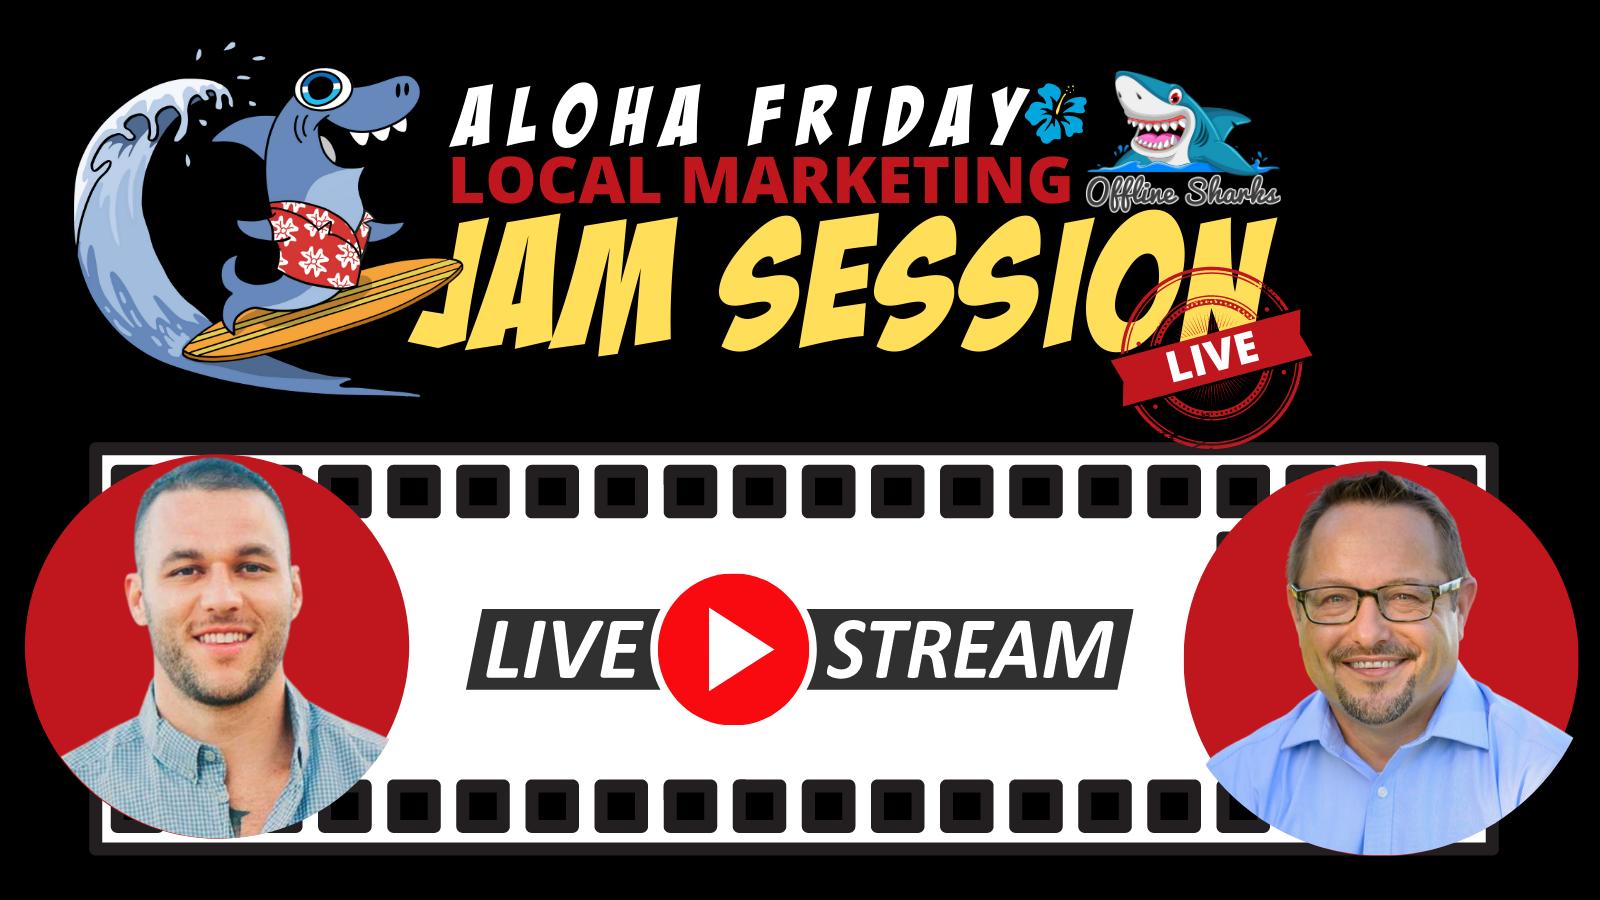 Aloha Friday Local Marketing Jam Session Offline Sharks